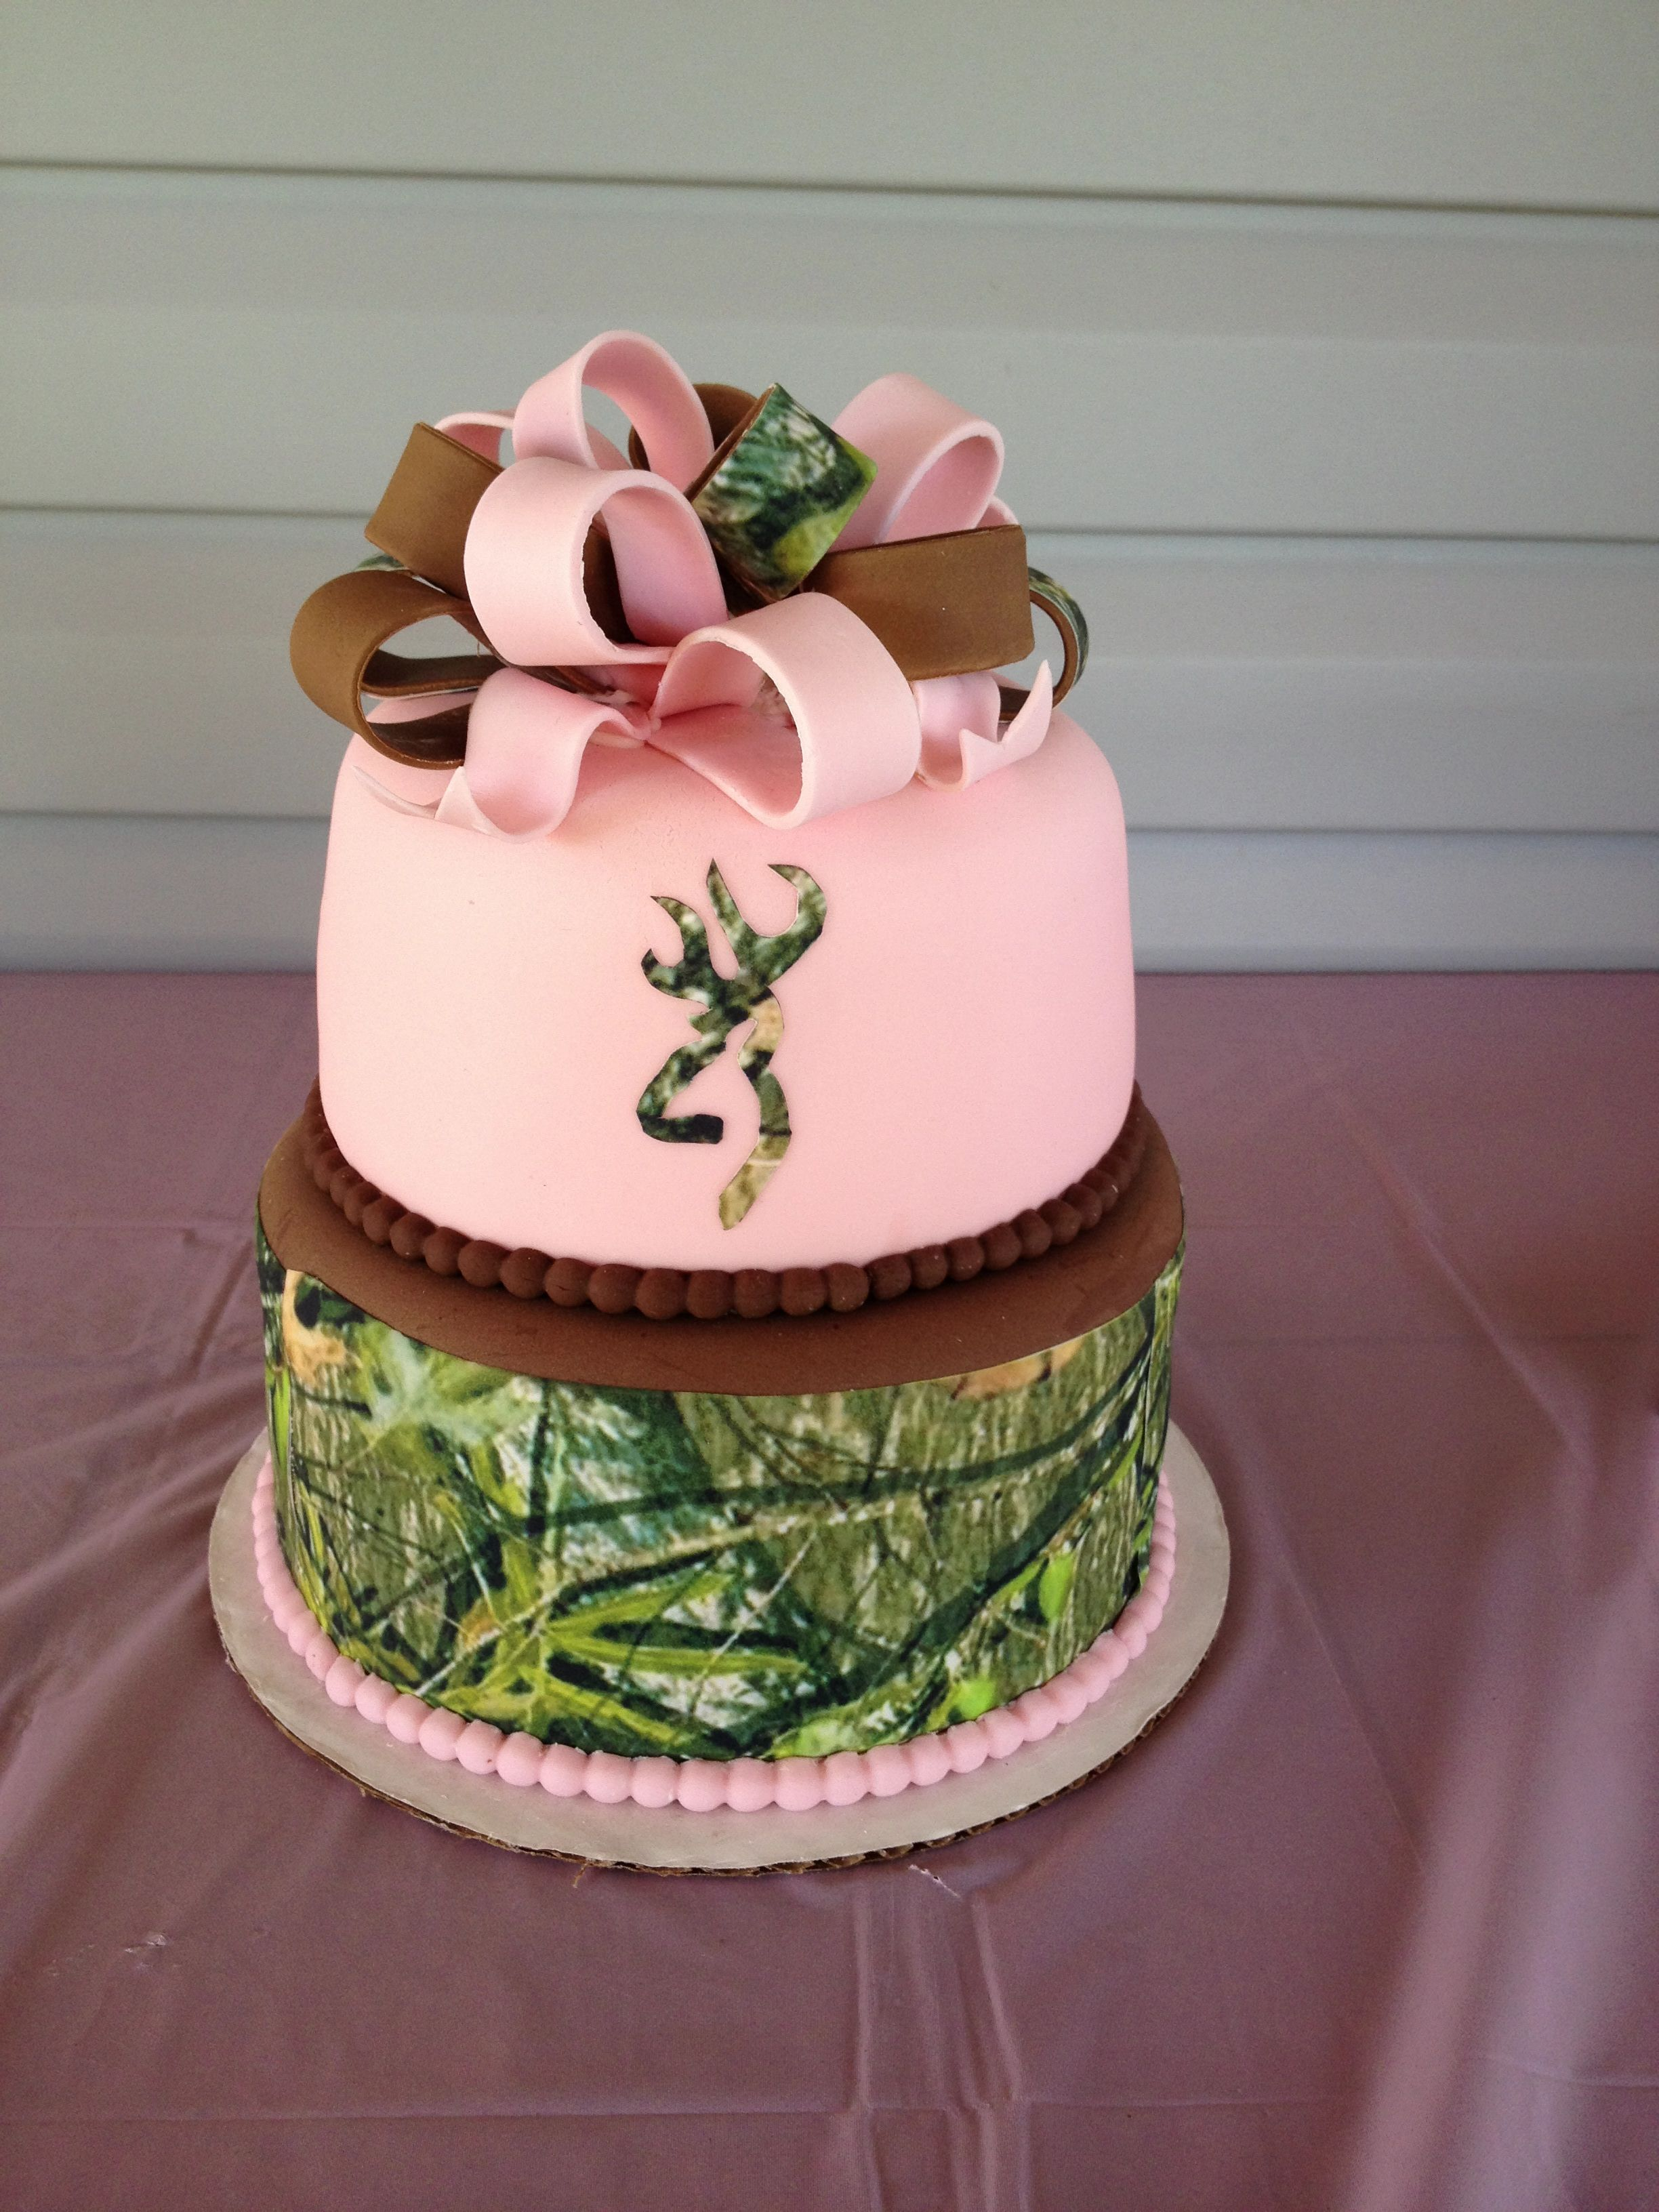 Swell 18Th Birthday Cake Fondant Cake With Mossy Oak Camoflauge Sugar Personalised Birthday Cards Paralily Jamesorg